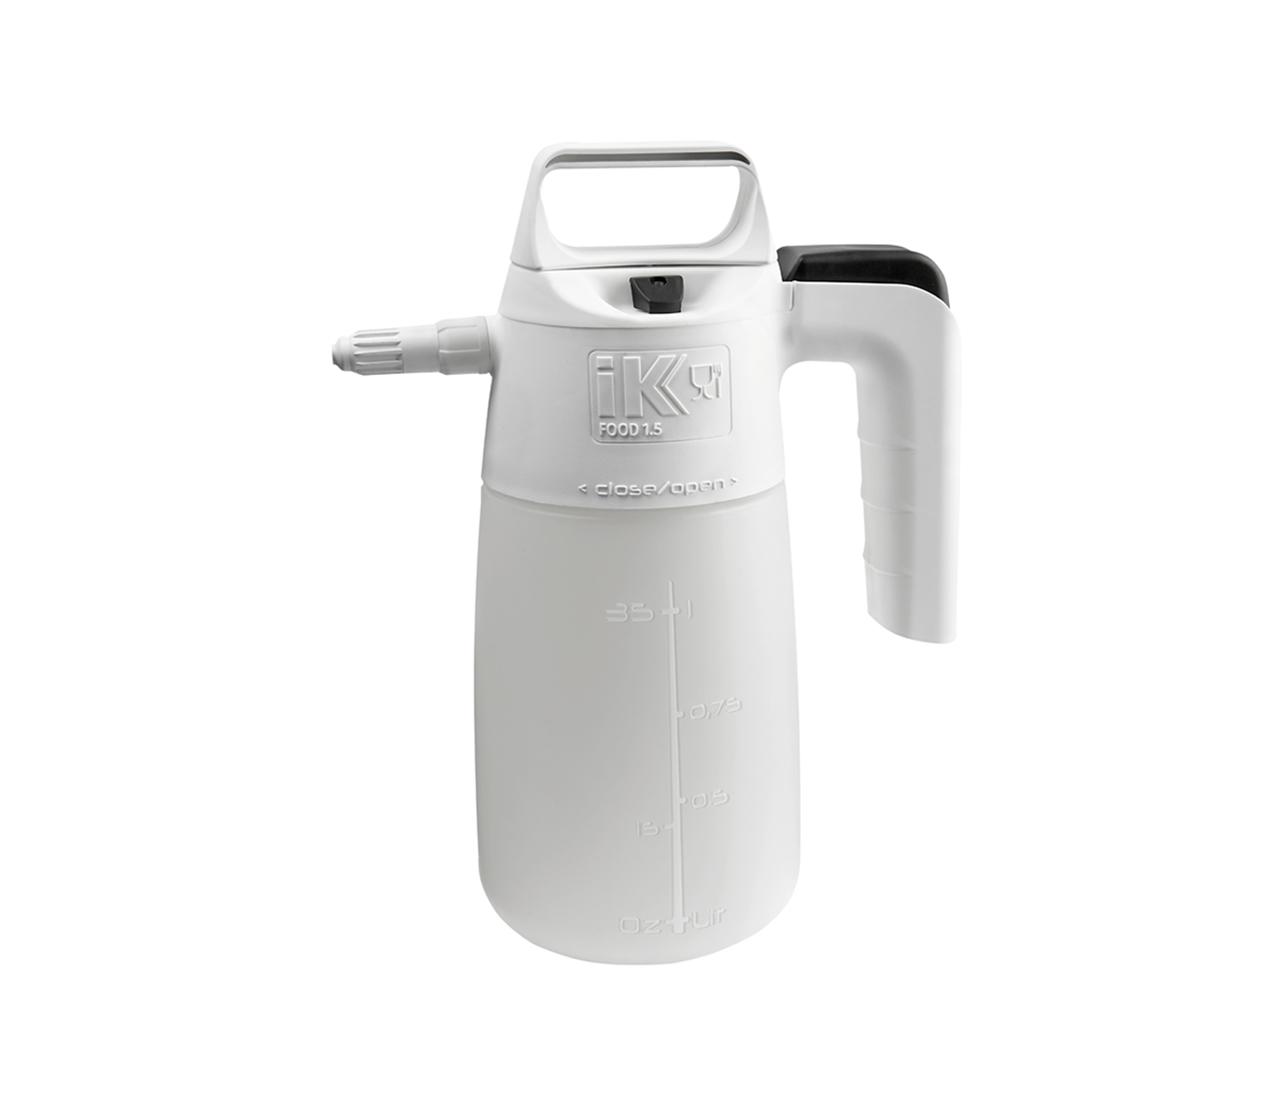 IK 35oz. Food 1.5 Professional Handheld Trigger Sprayer